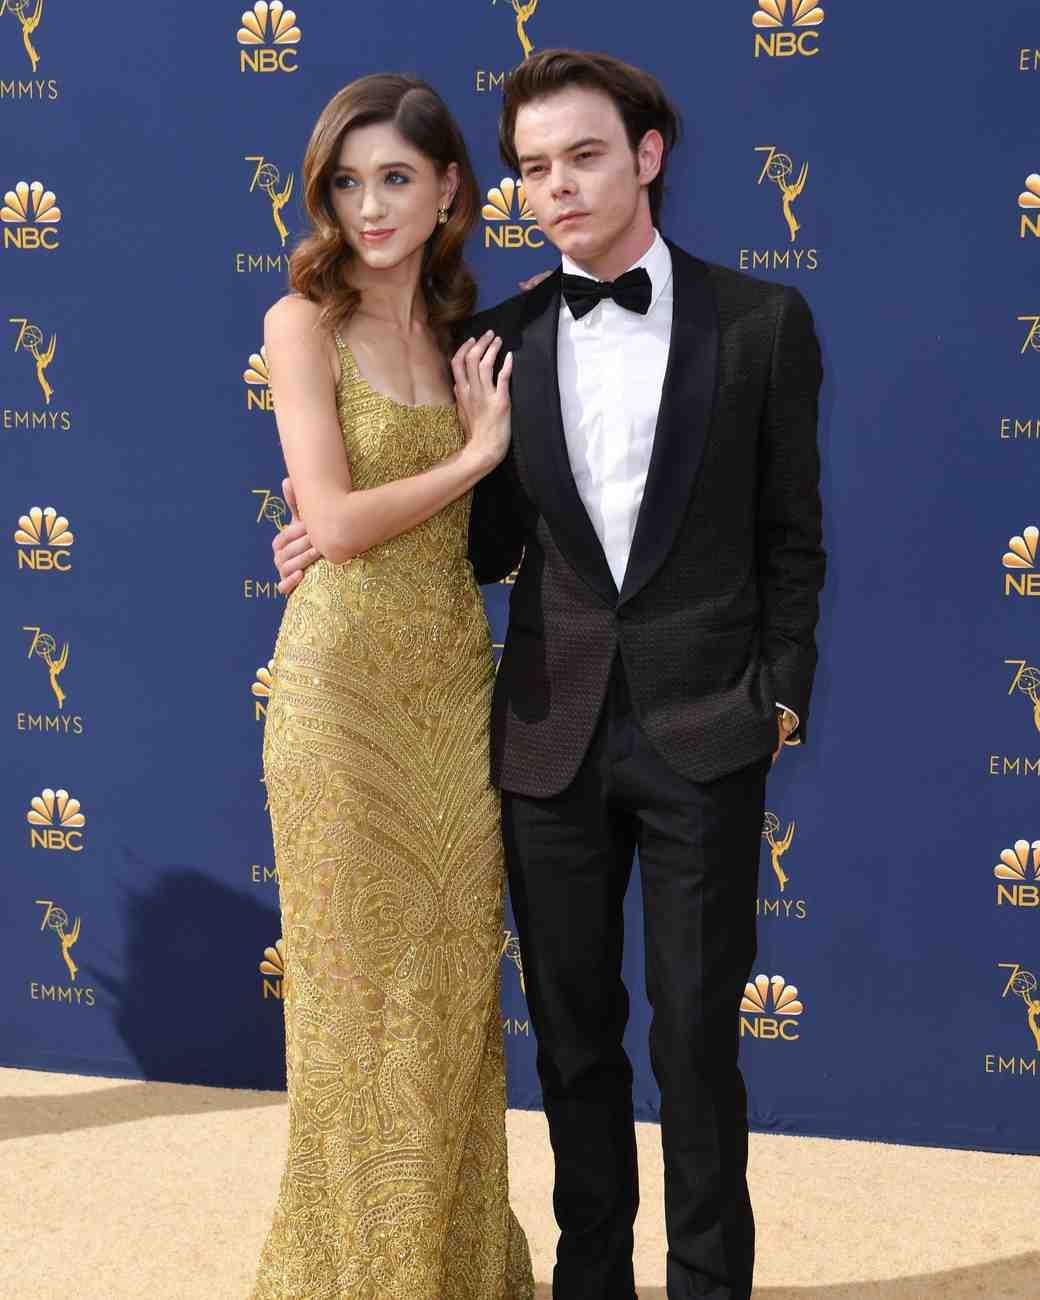 Natalia Dyer and Charlie Heaton Emmys 2018